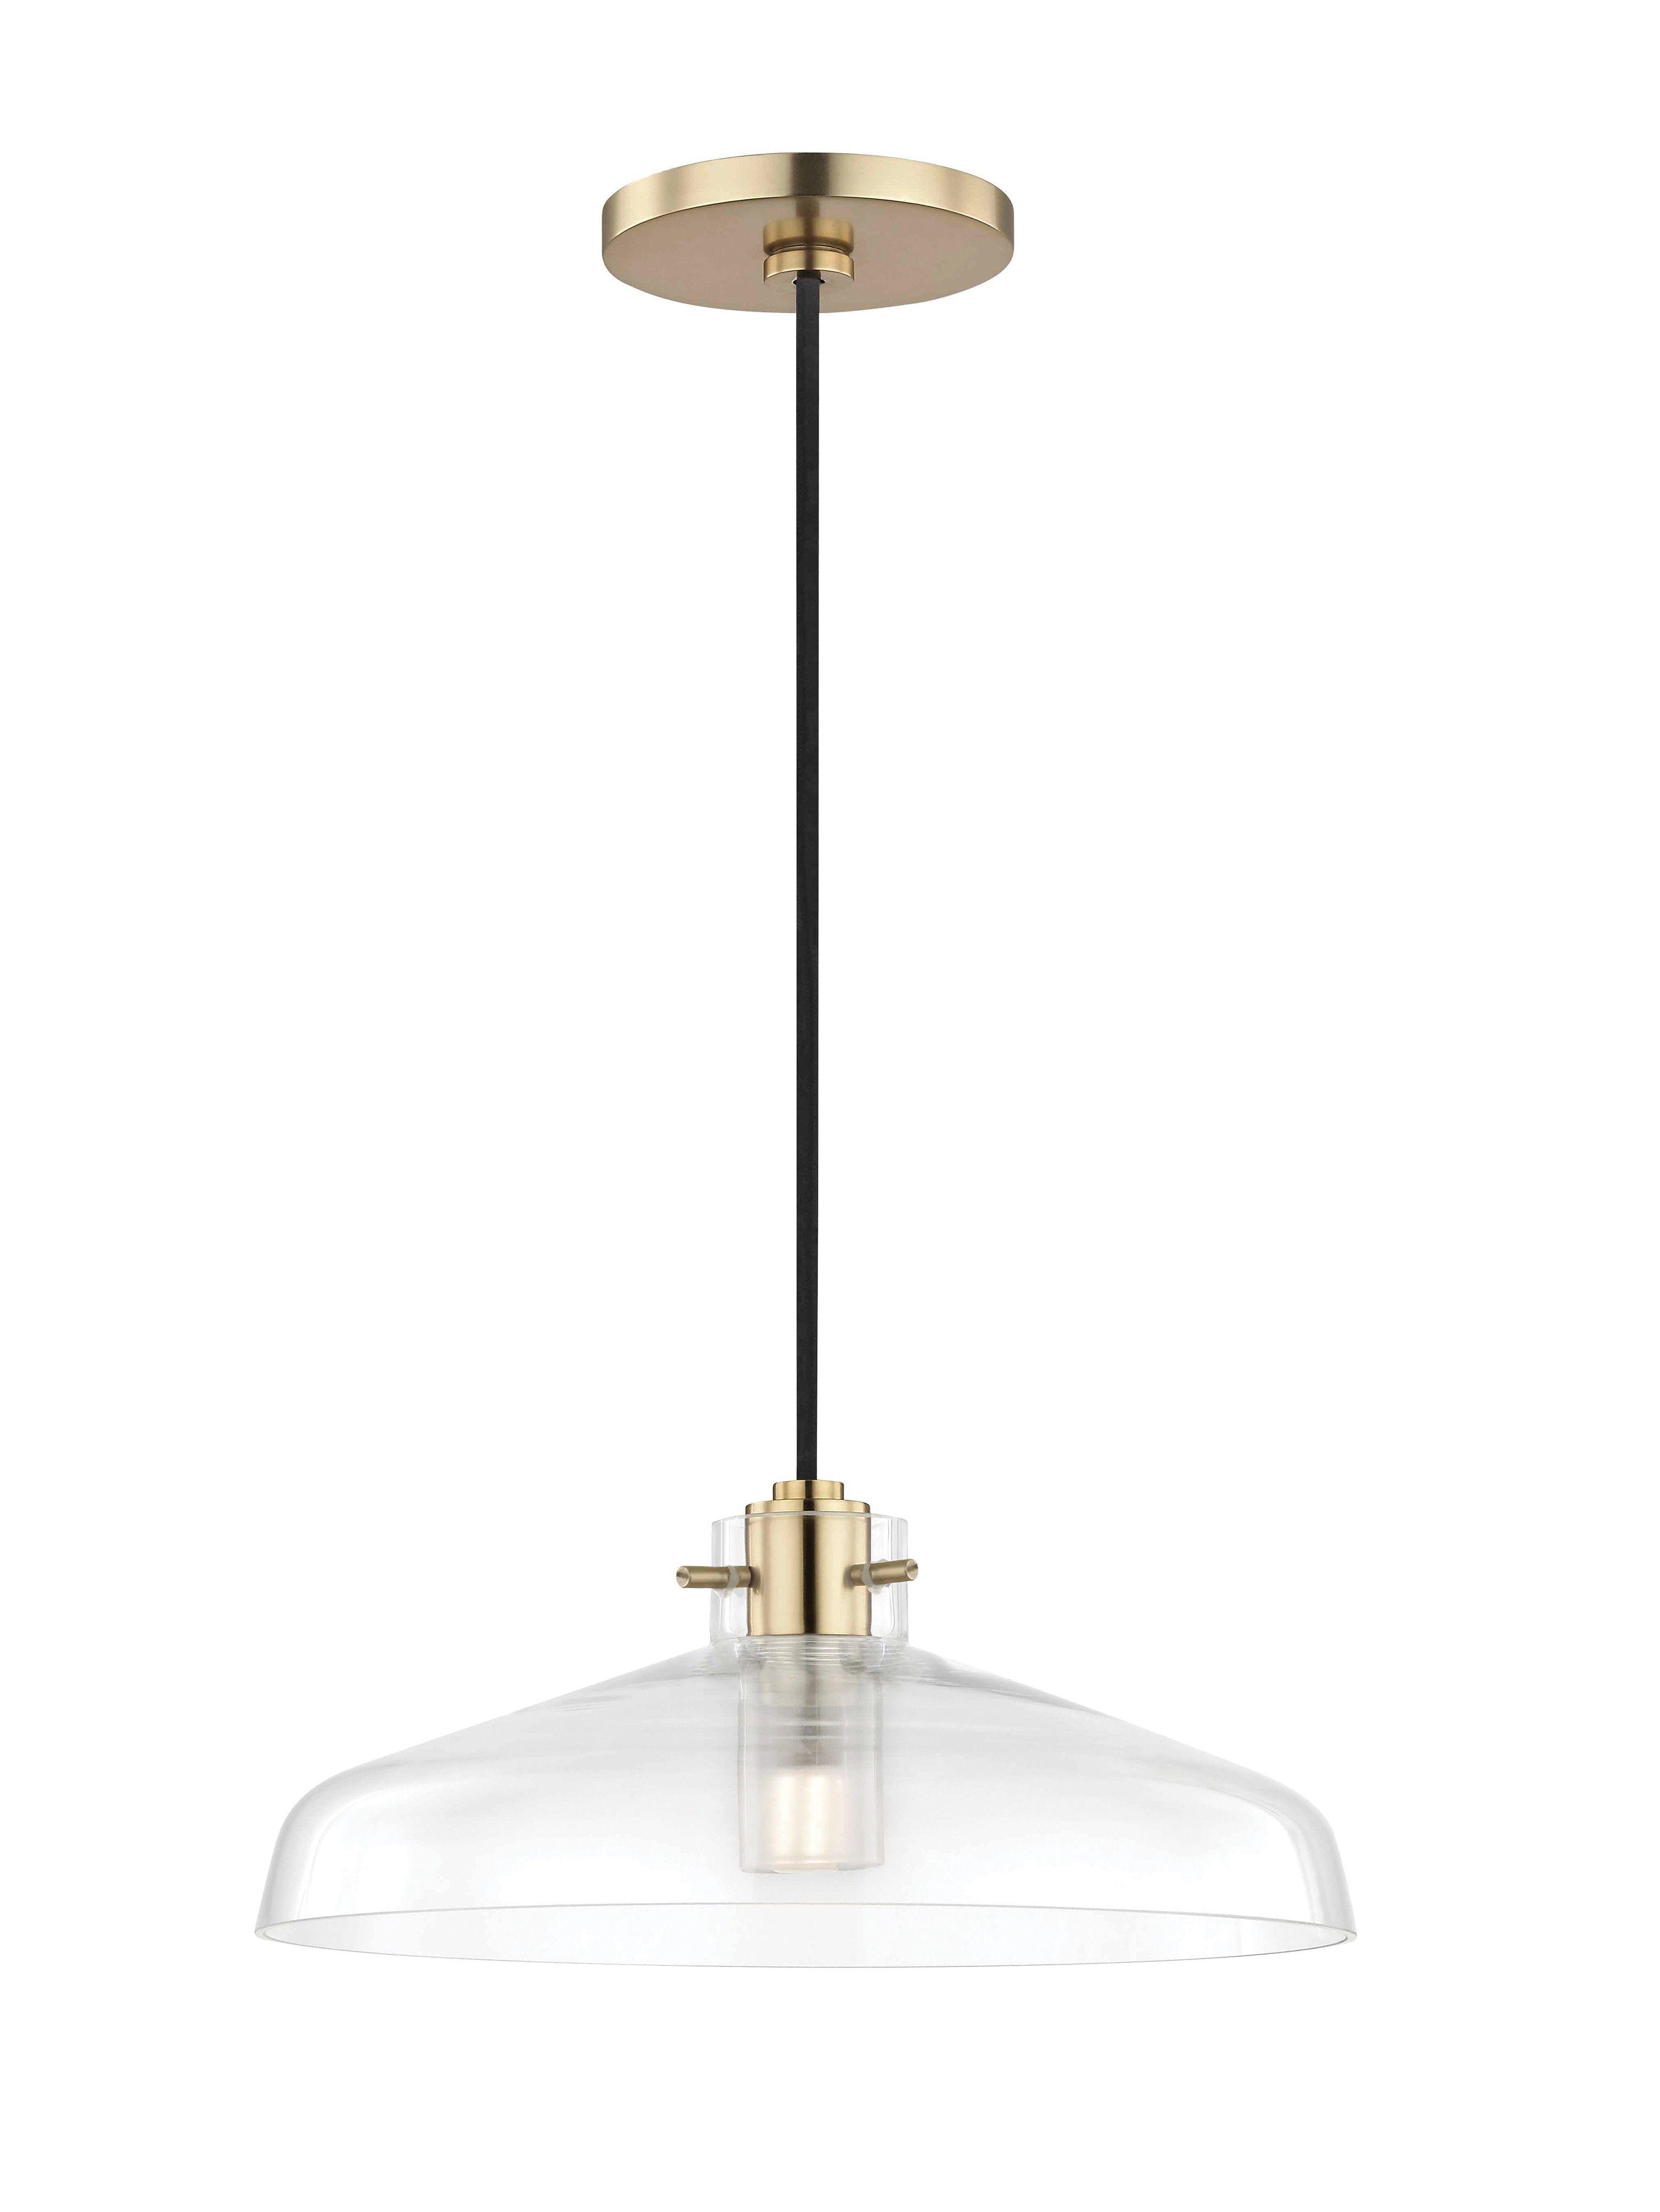 Lighting Parts Mid Century Style Semi Flush Cluster Socket Center Post Ceiling Light Fixture Home Furniture Diy Mhg Co Ke